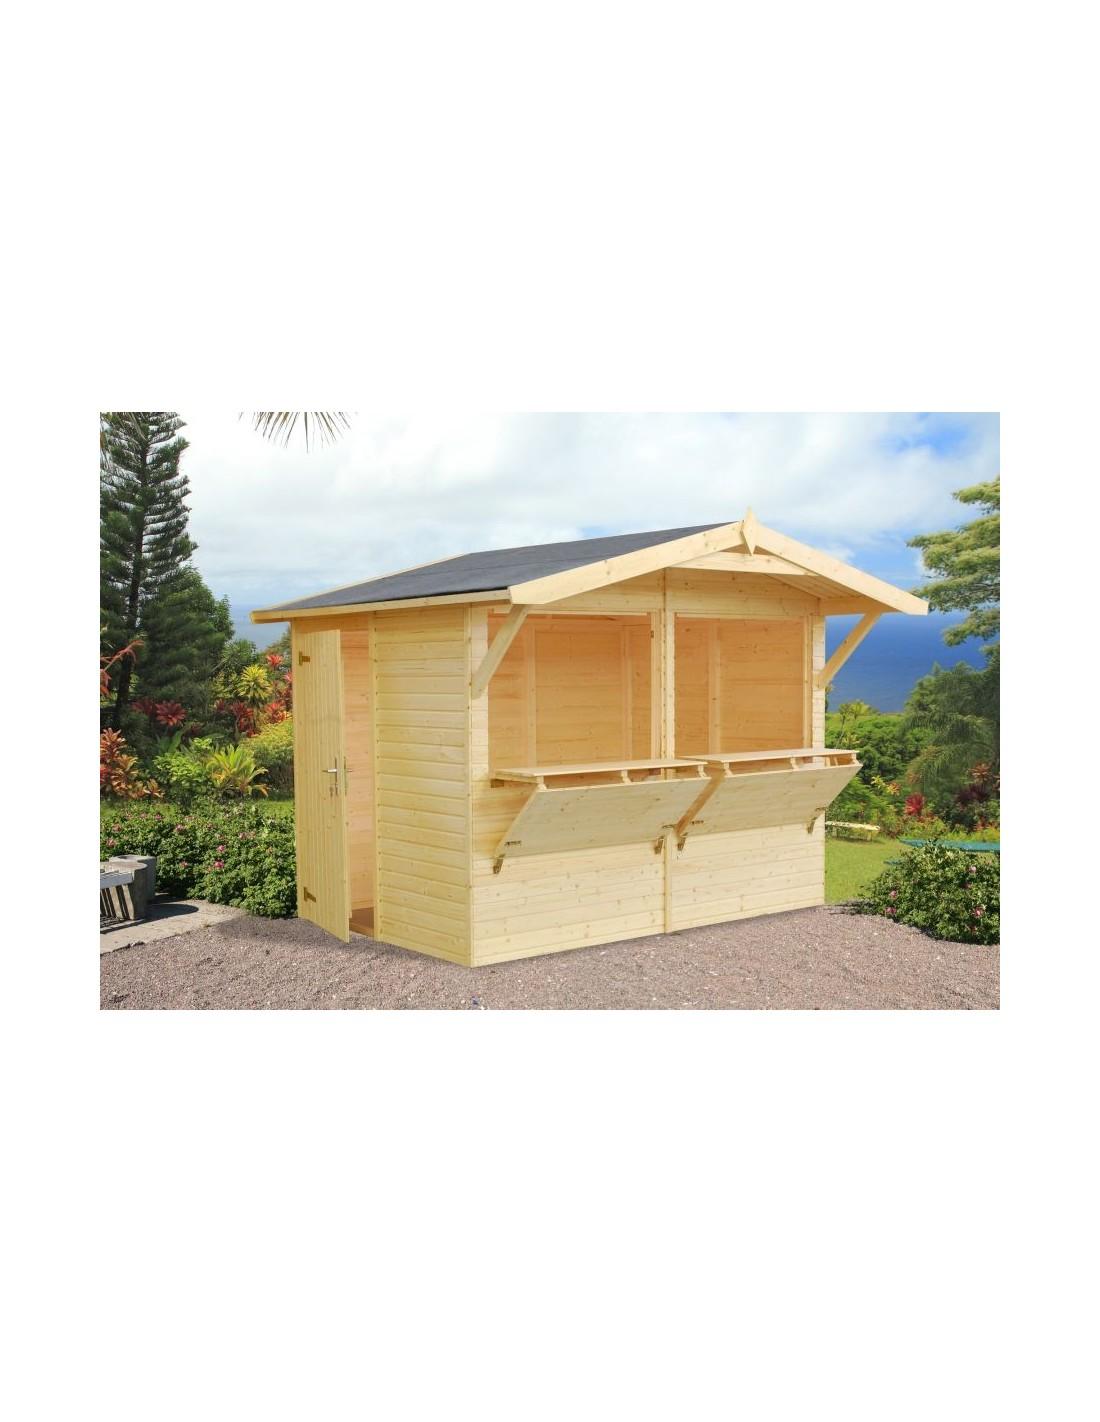 Abri de jardin stella 5 2 m style buvette bois massif 16 mm - Construir caseta de madera ...